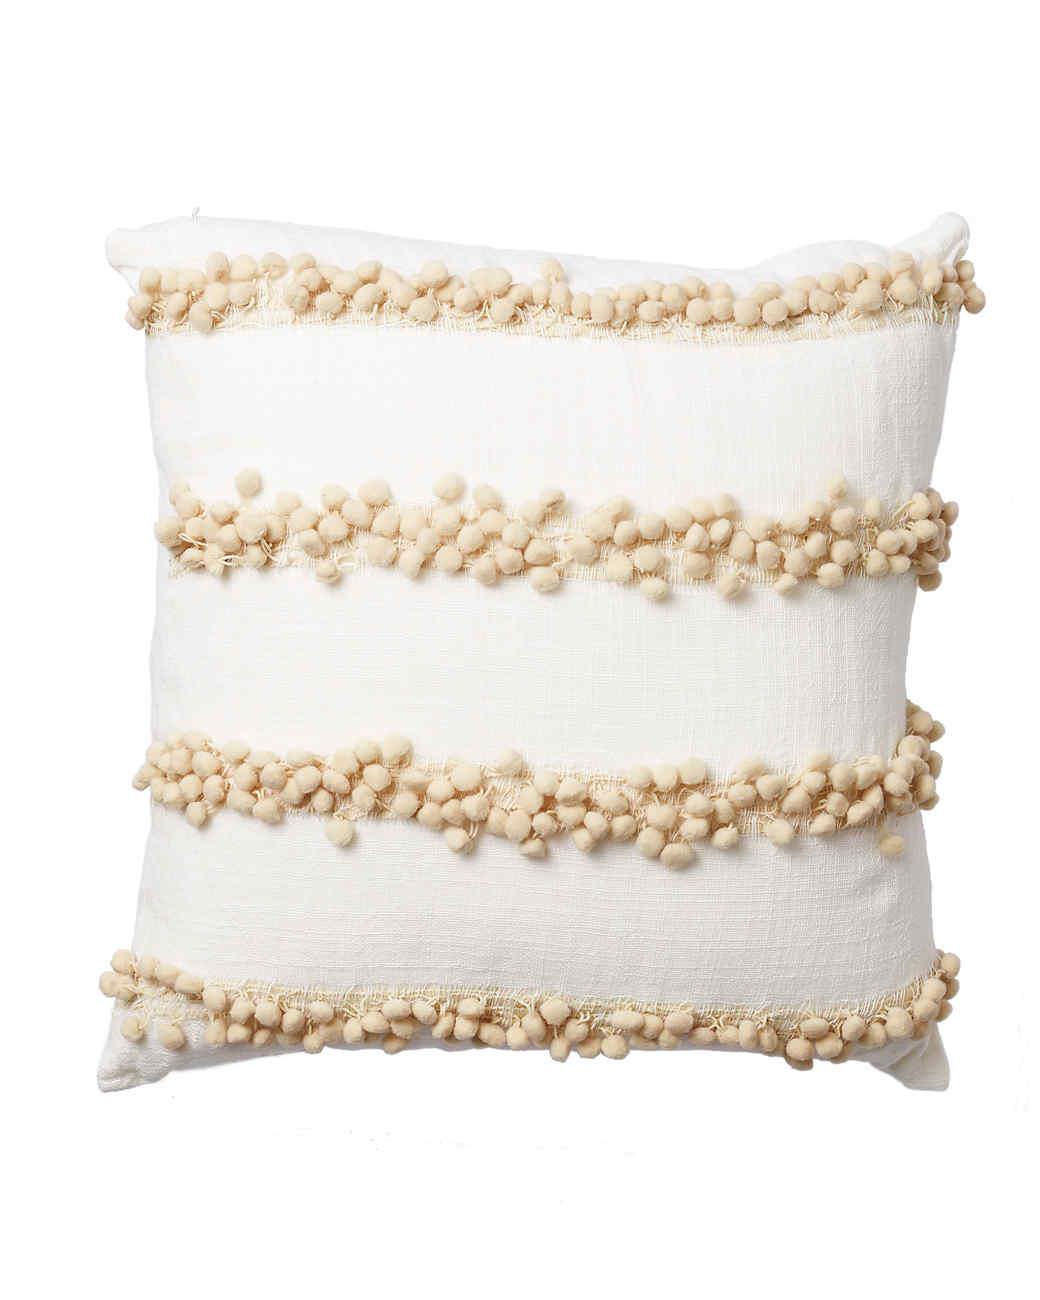 anthropologie-pillow-056-d111219.jpg